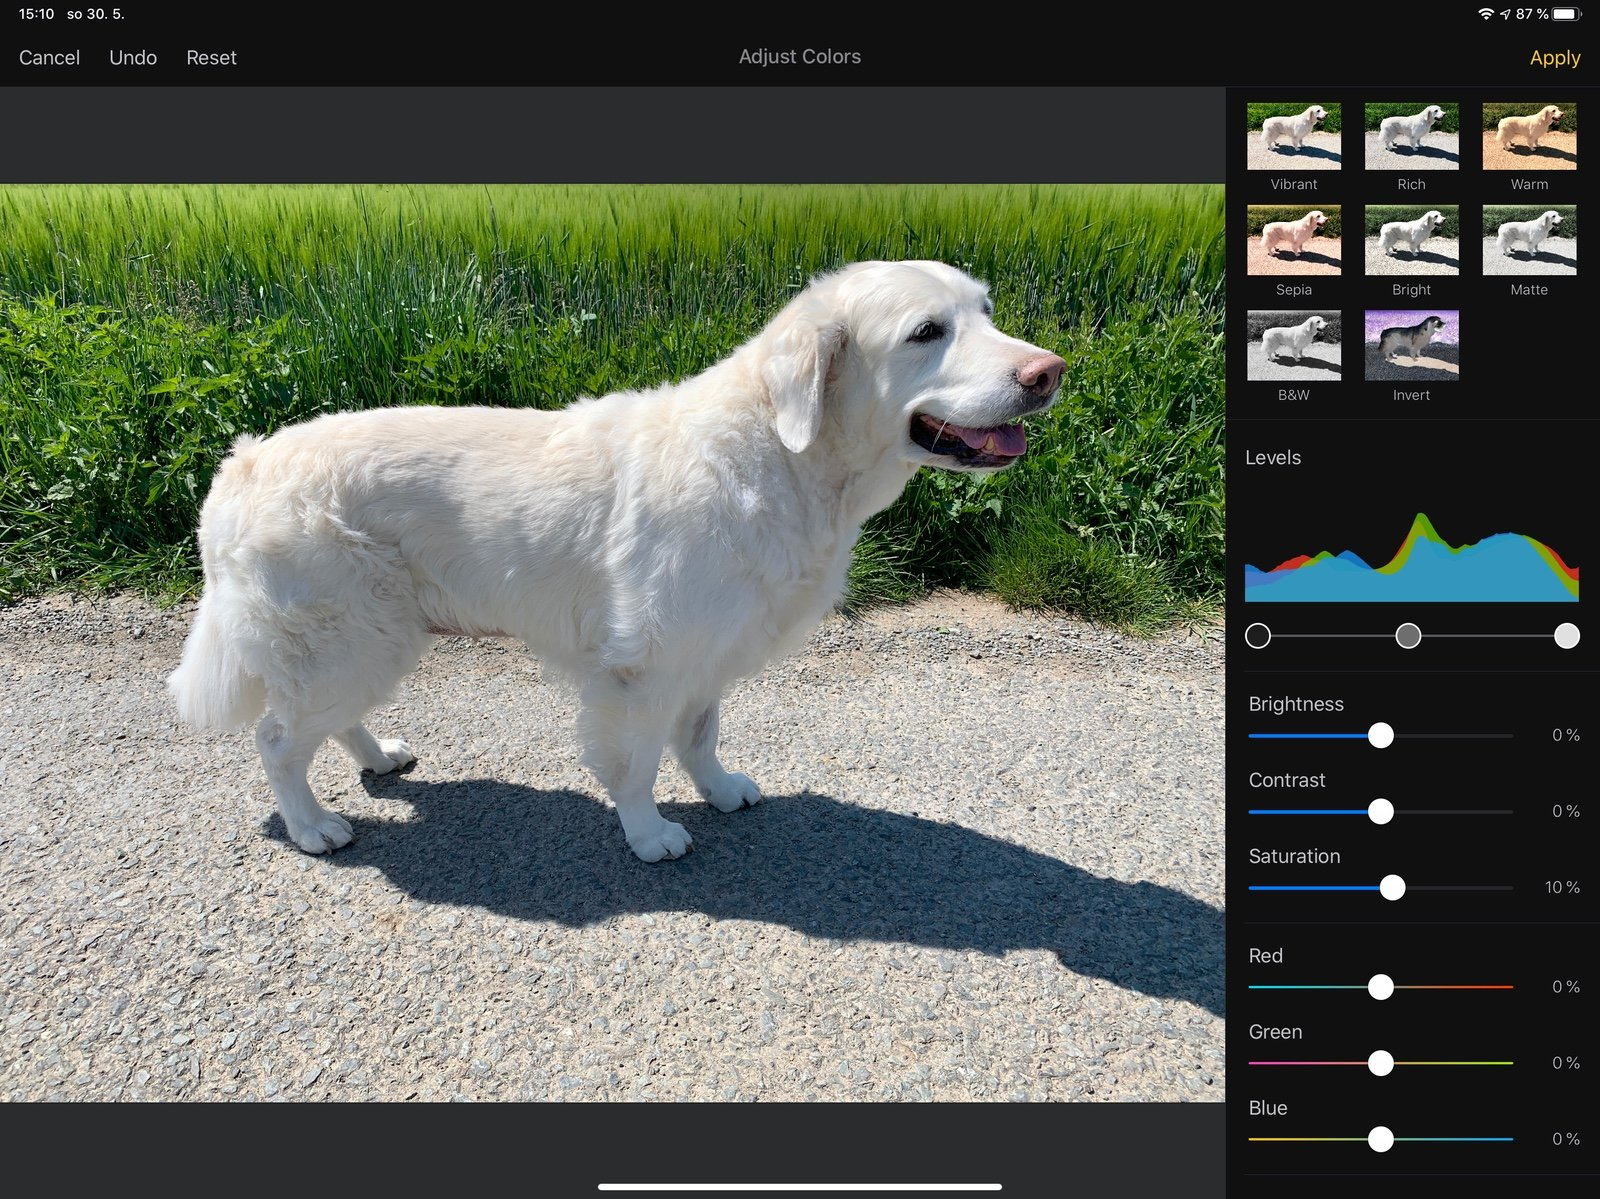 Aplikace Pixelmator na iPadu Pro